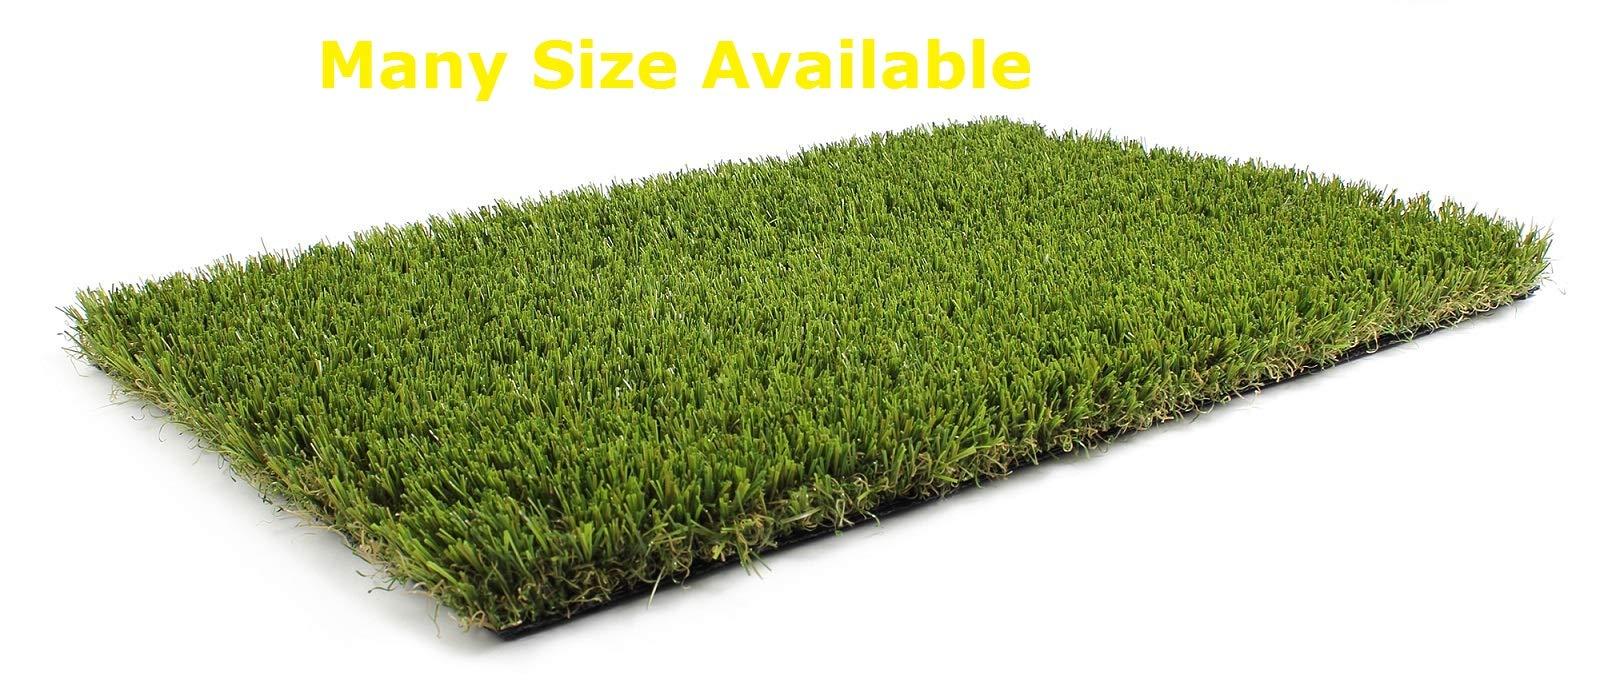 Synturfmats 4'x8' Artificial Grass Carpert Rug - Premium Indoor / Outdoor Green Synthetic Turf, 4-Toned Blades